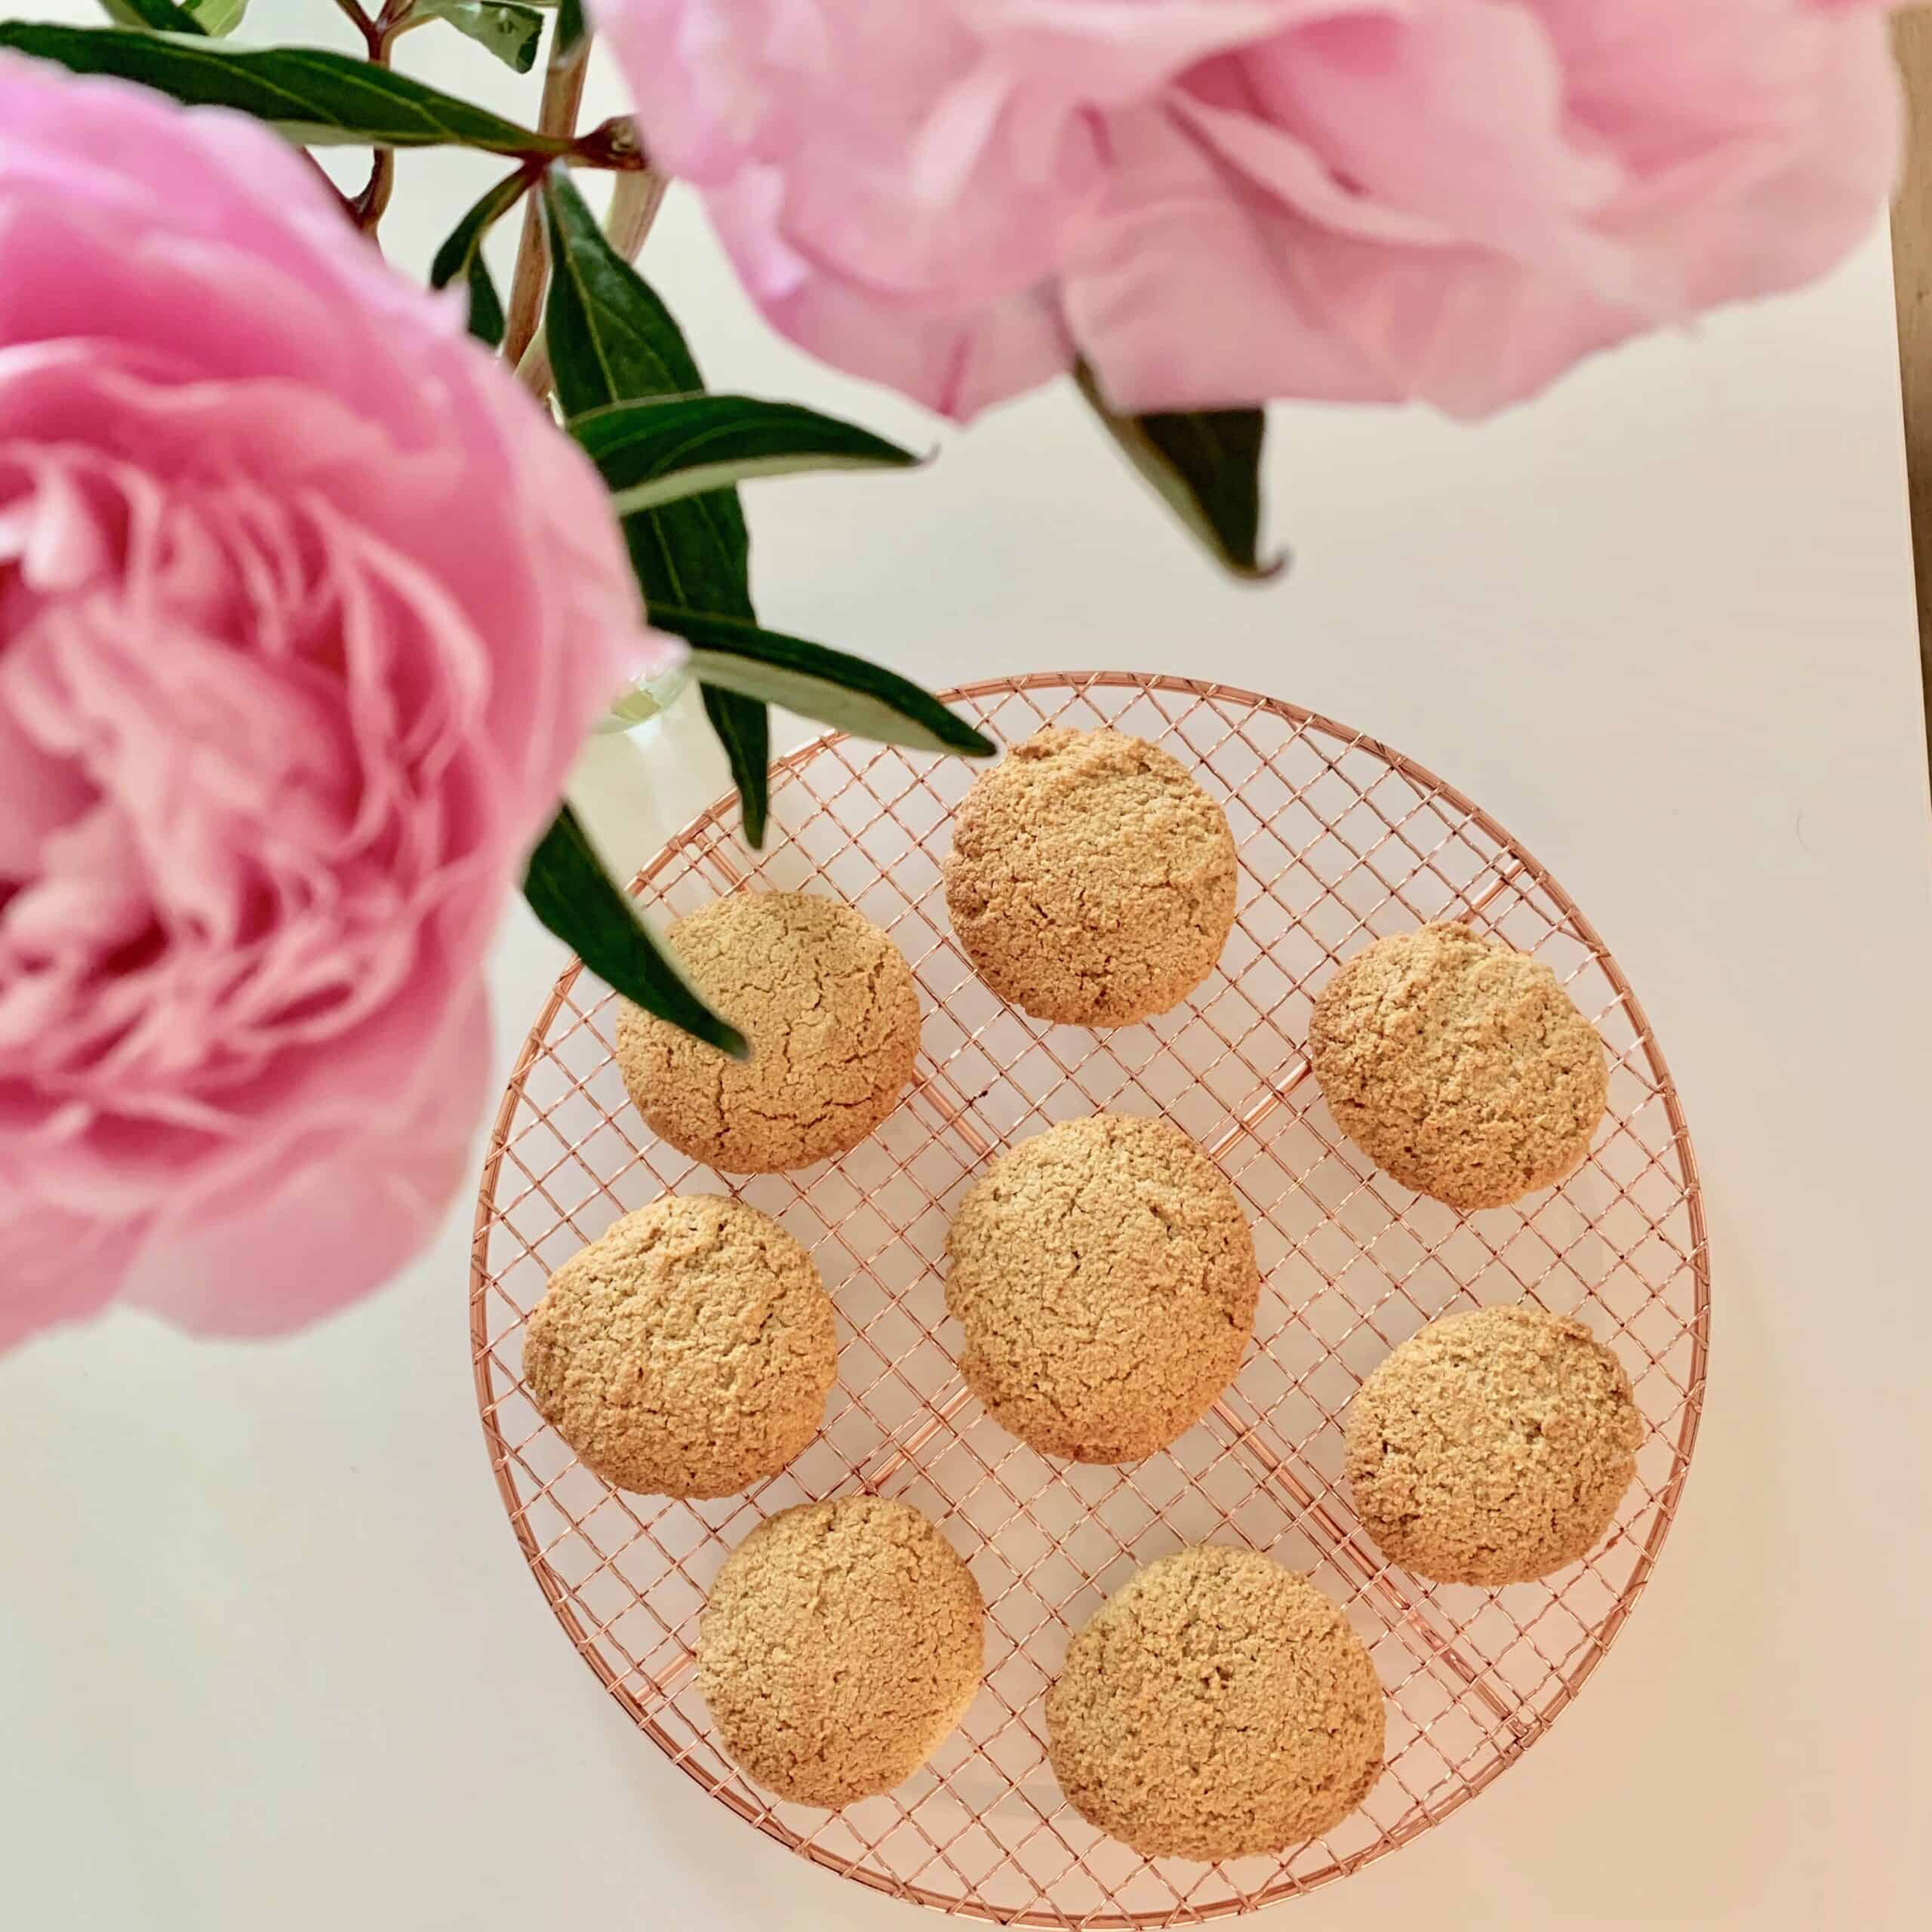 almond cookies homemade